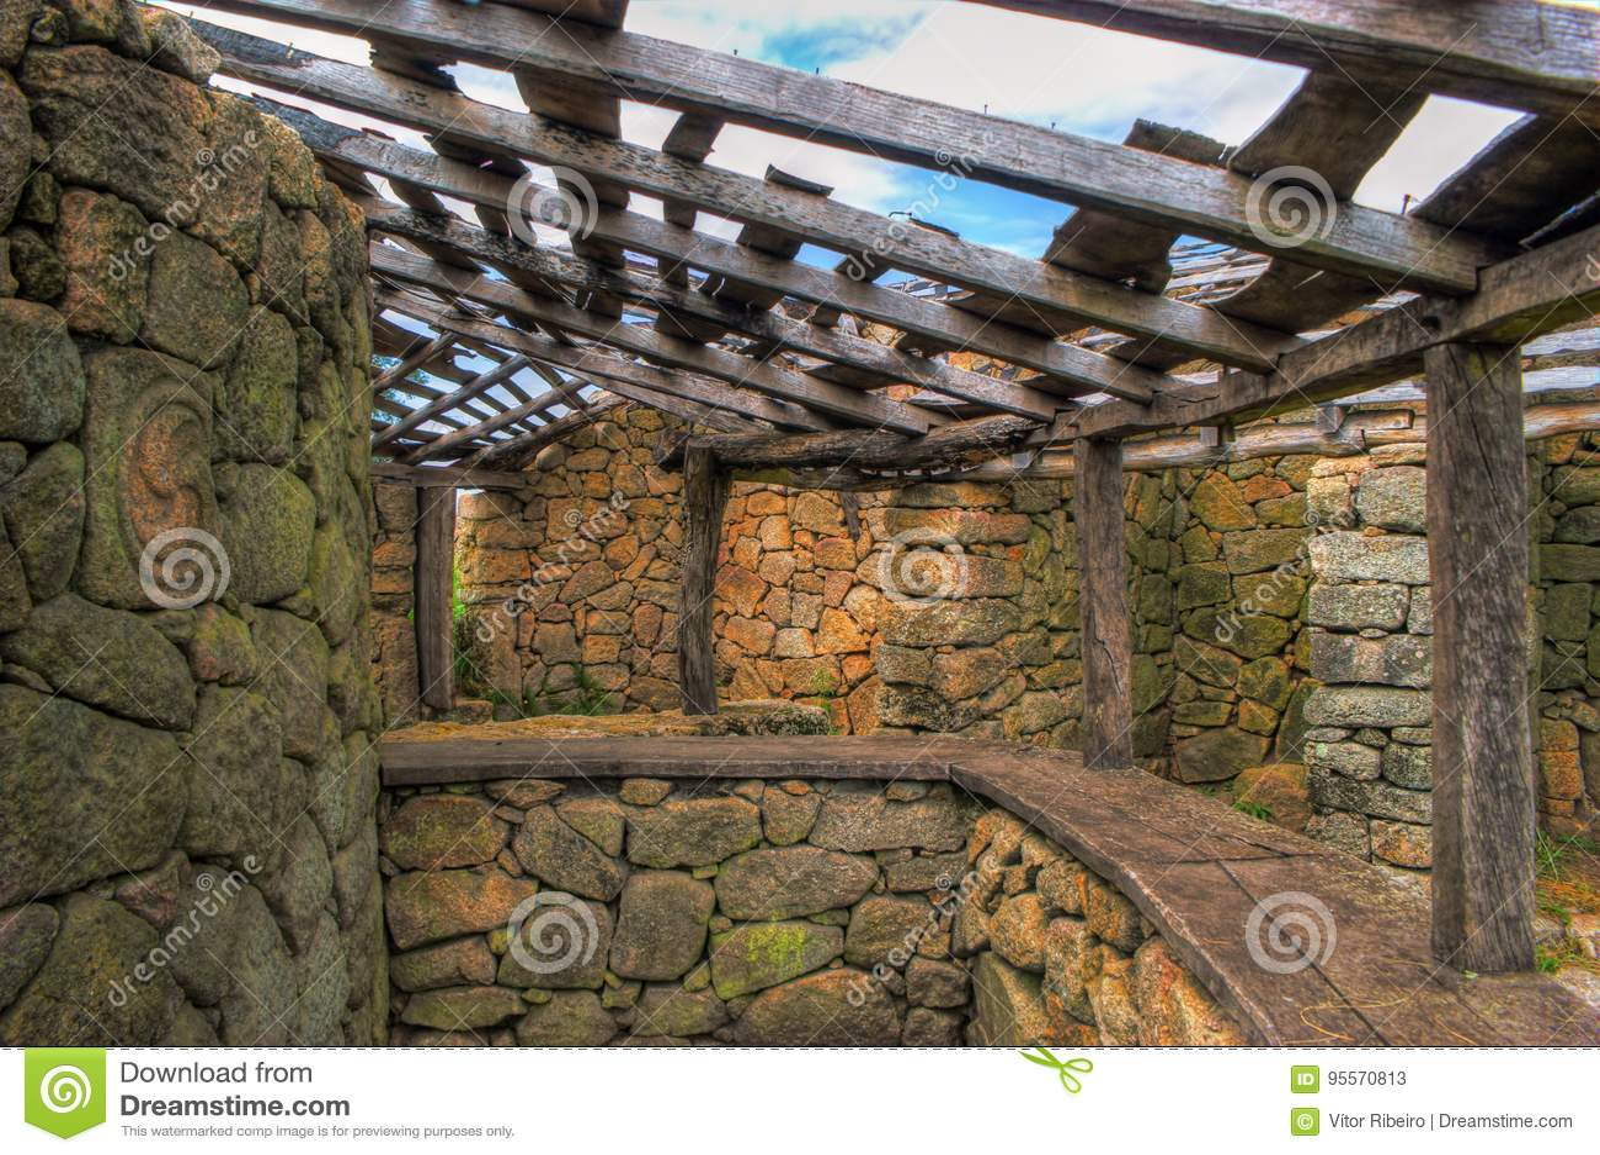 Proto-historic settlement in Sanfins de Ferreira